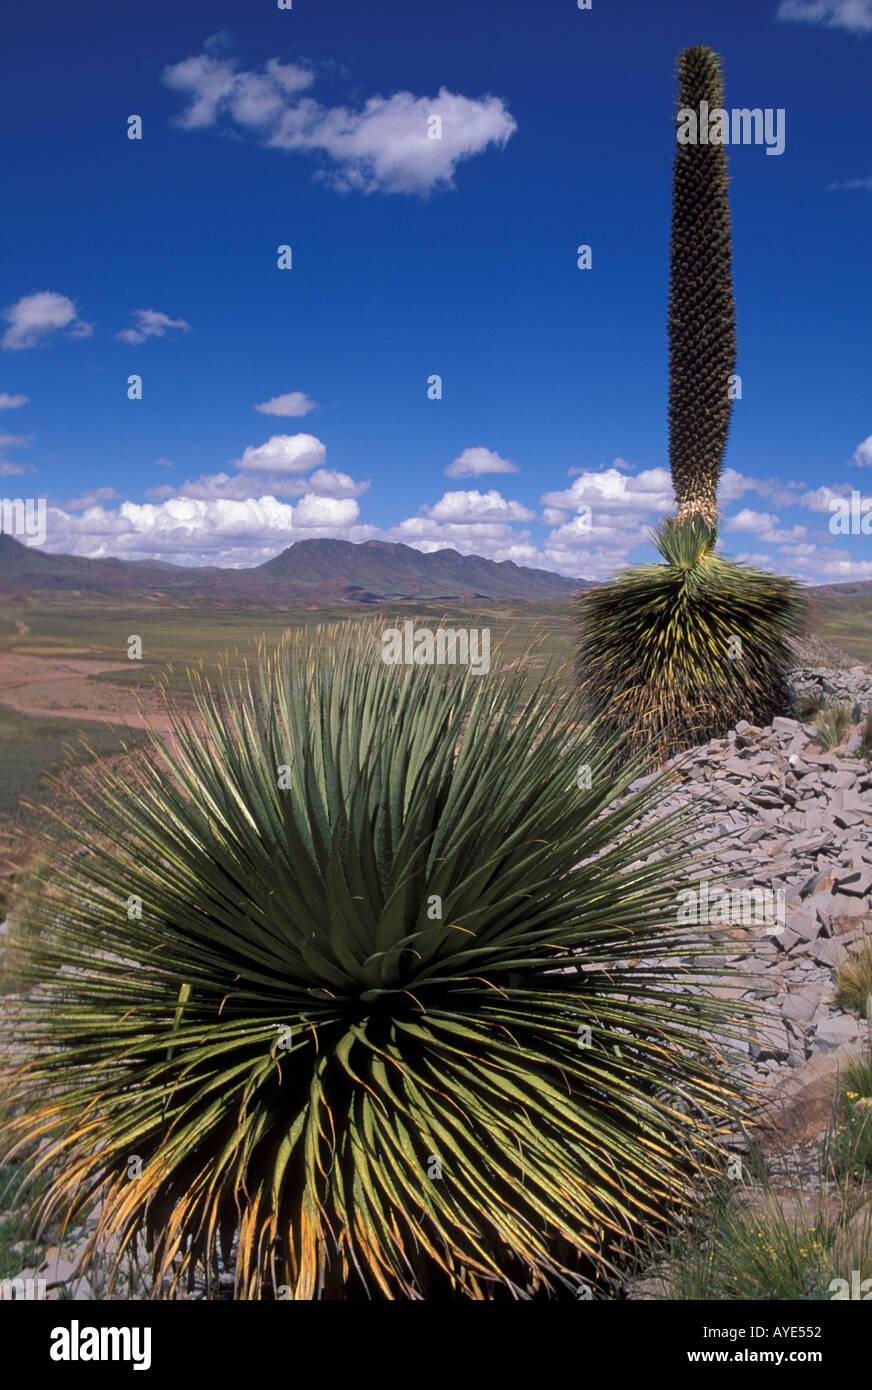 Puya Raimondii century plant Cerro Comache National Park Altiplano Bolivia Stock Photo